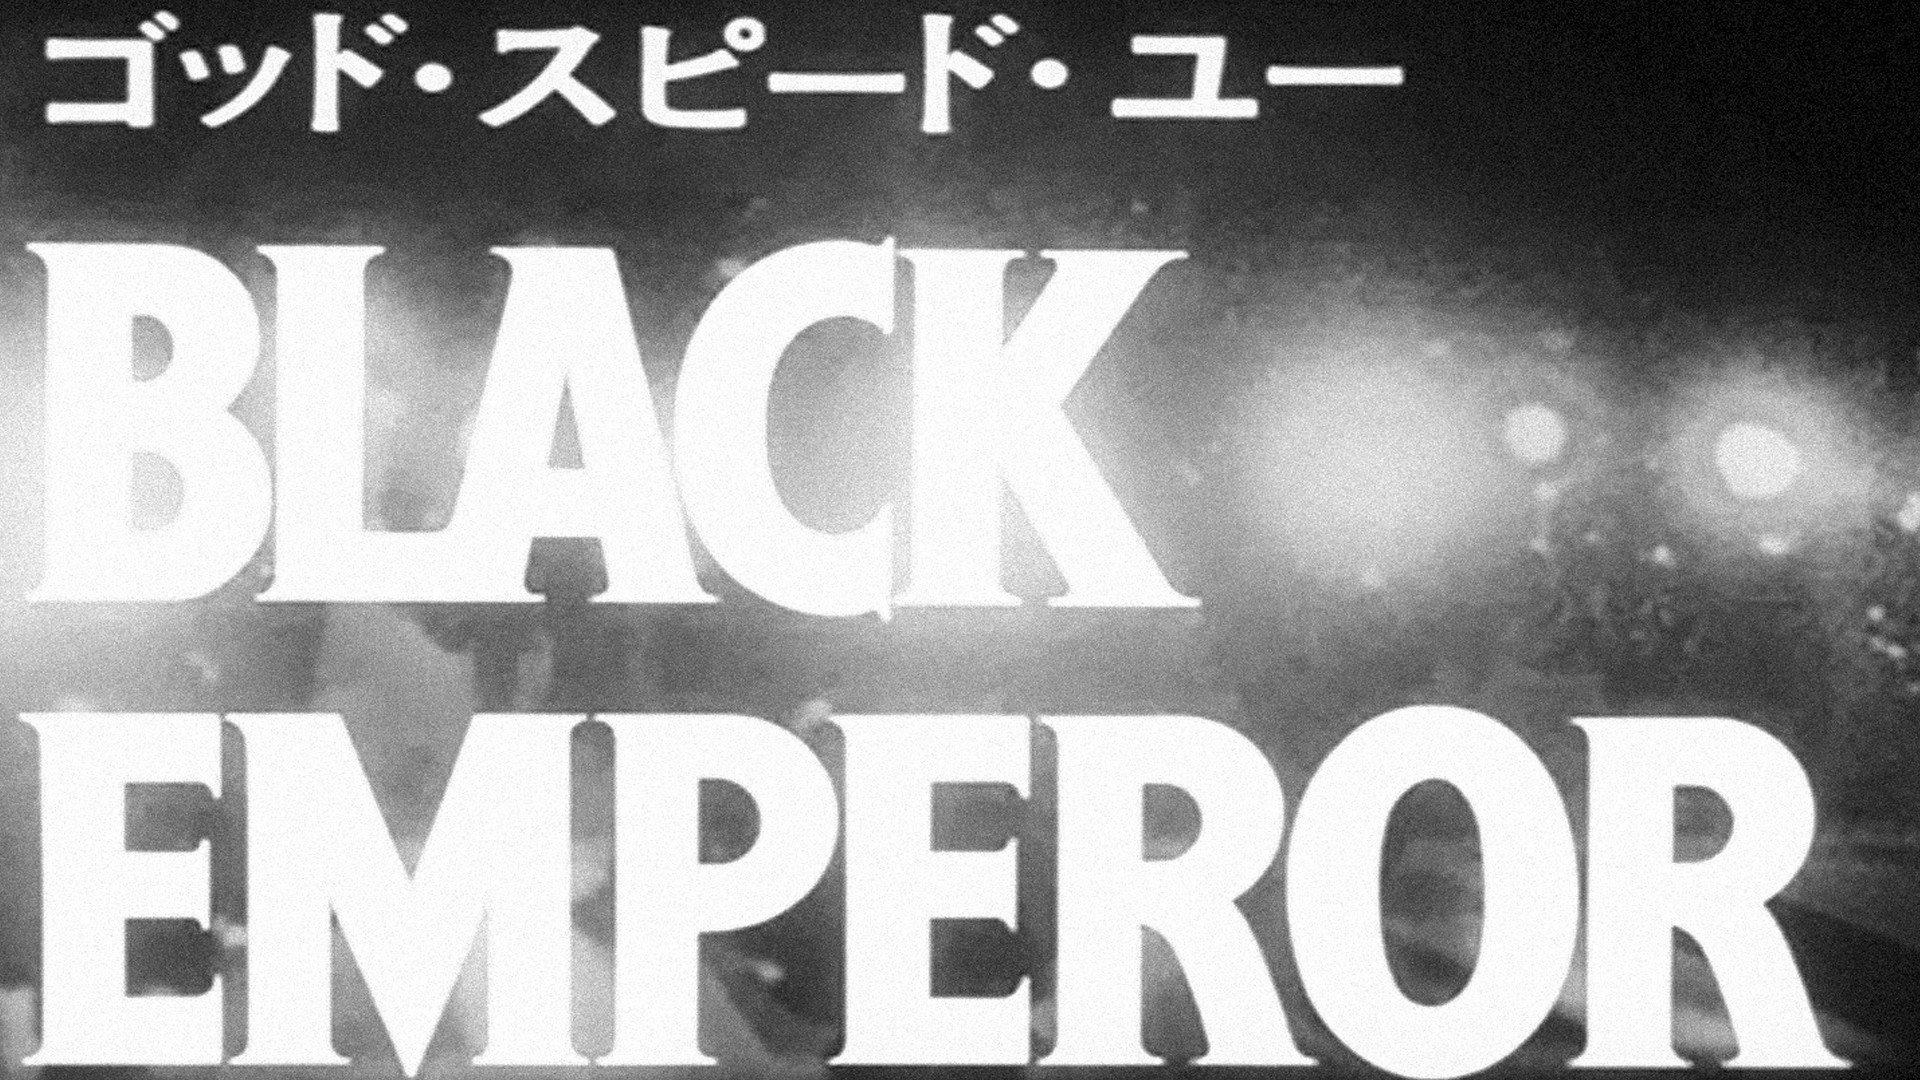 Wallpaper 1920x1080 Px Godspeed You Black Emperor Music